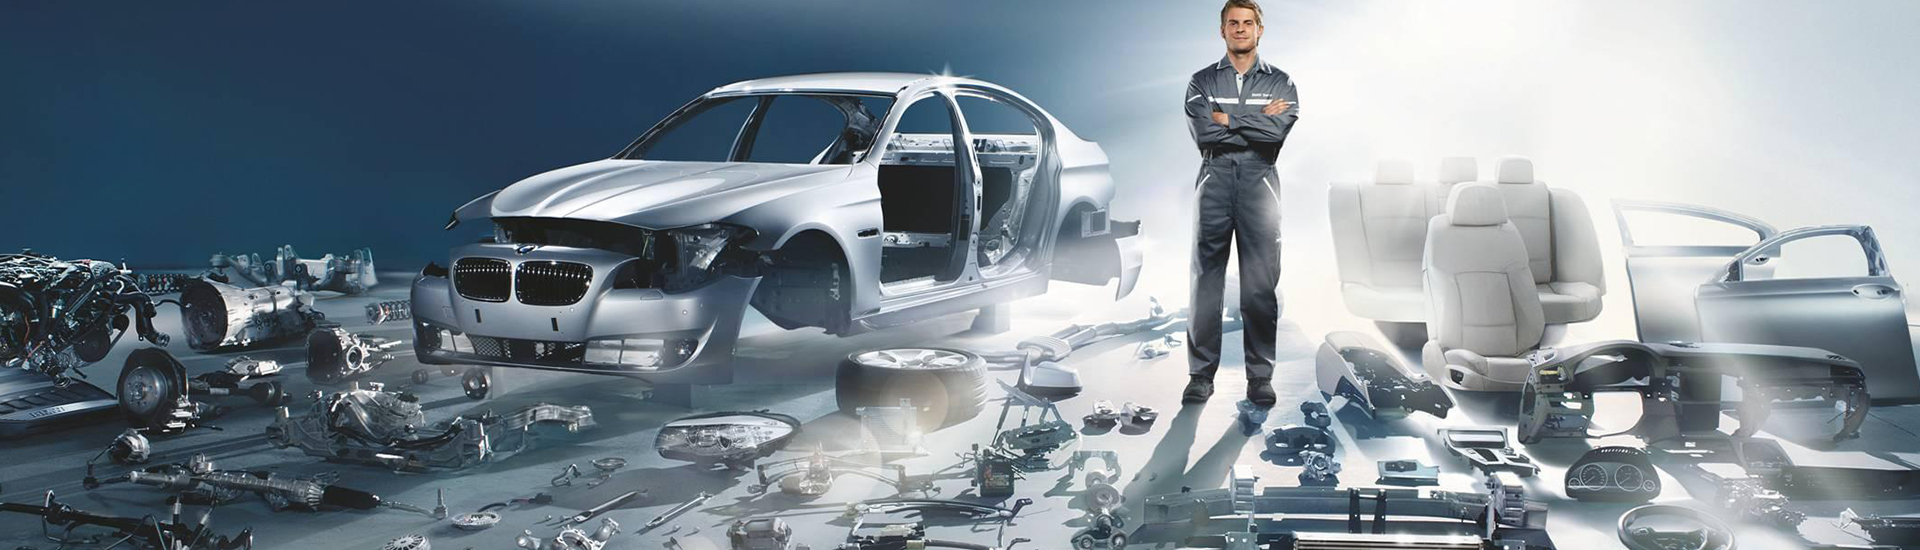 BMW Oto Parçaları Yurt Dışı Sipariş